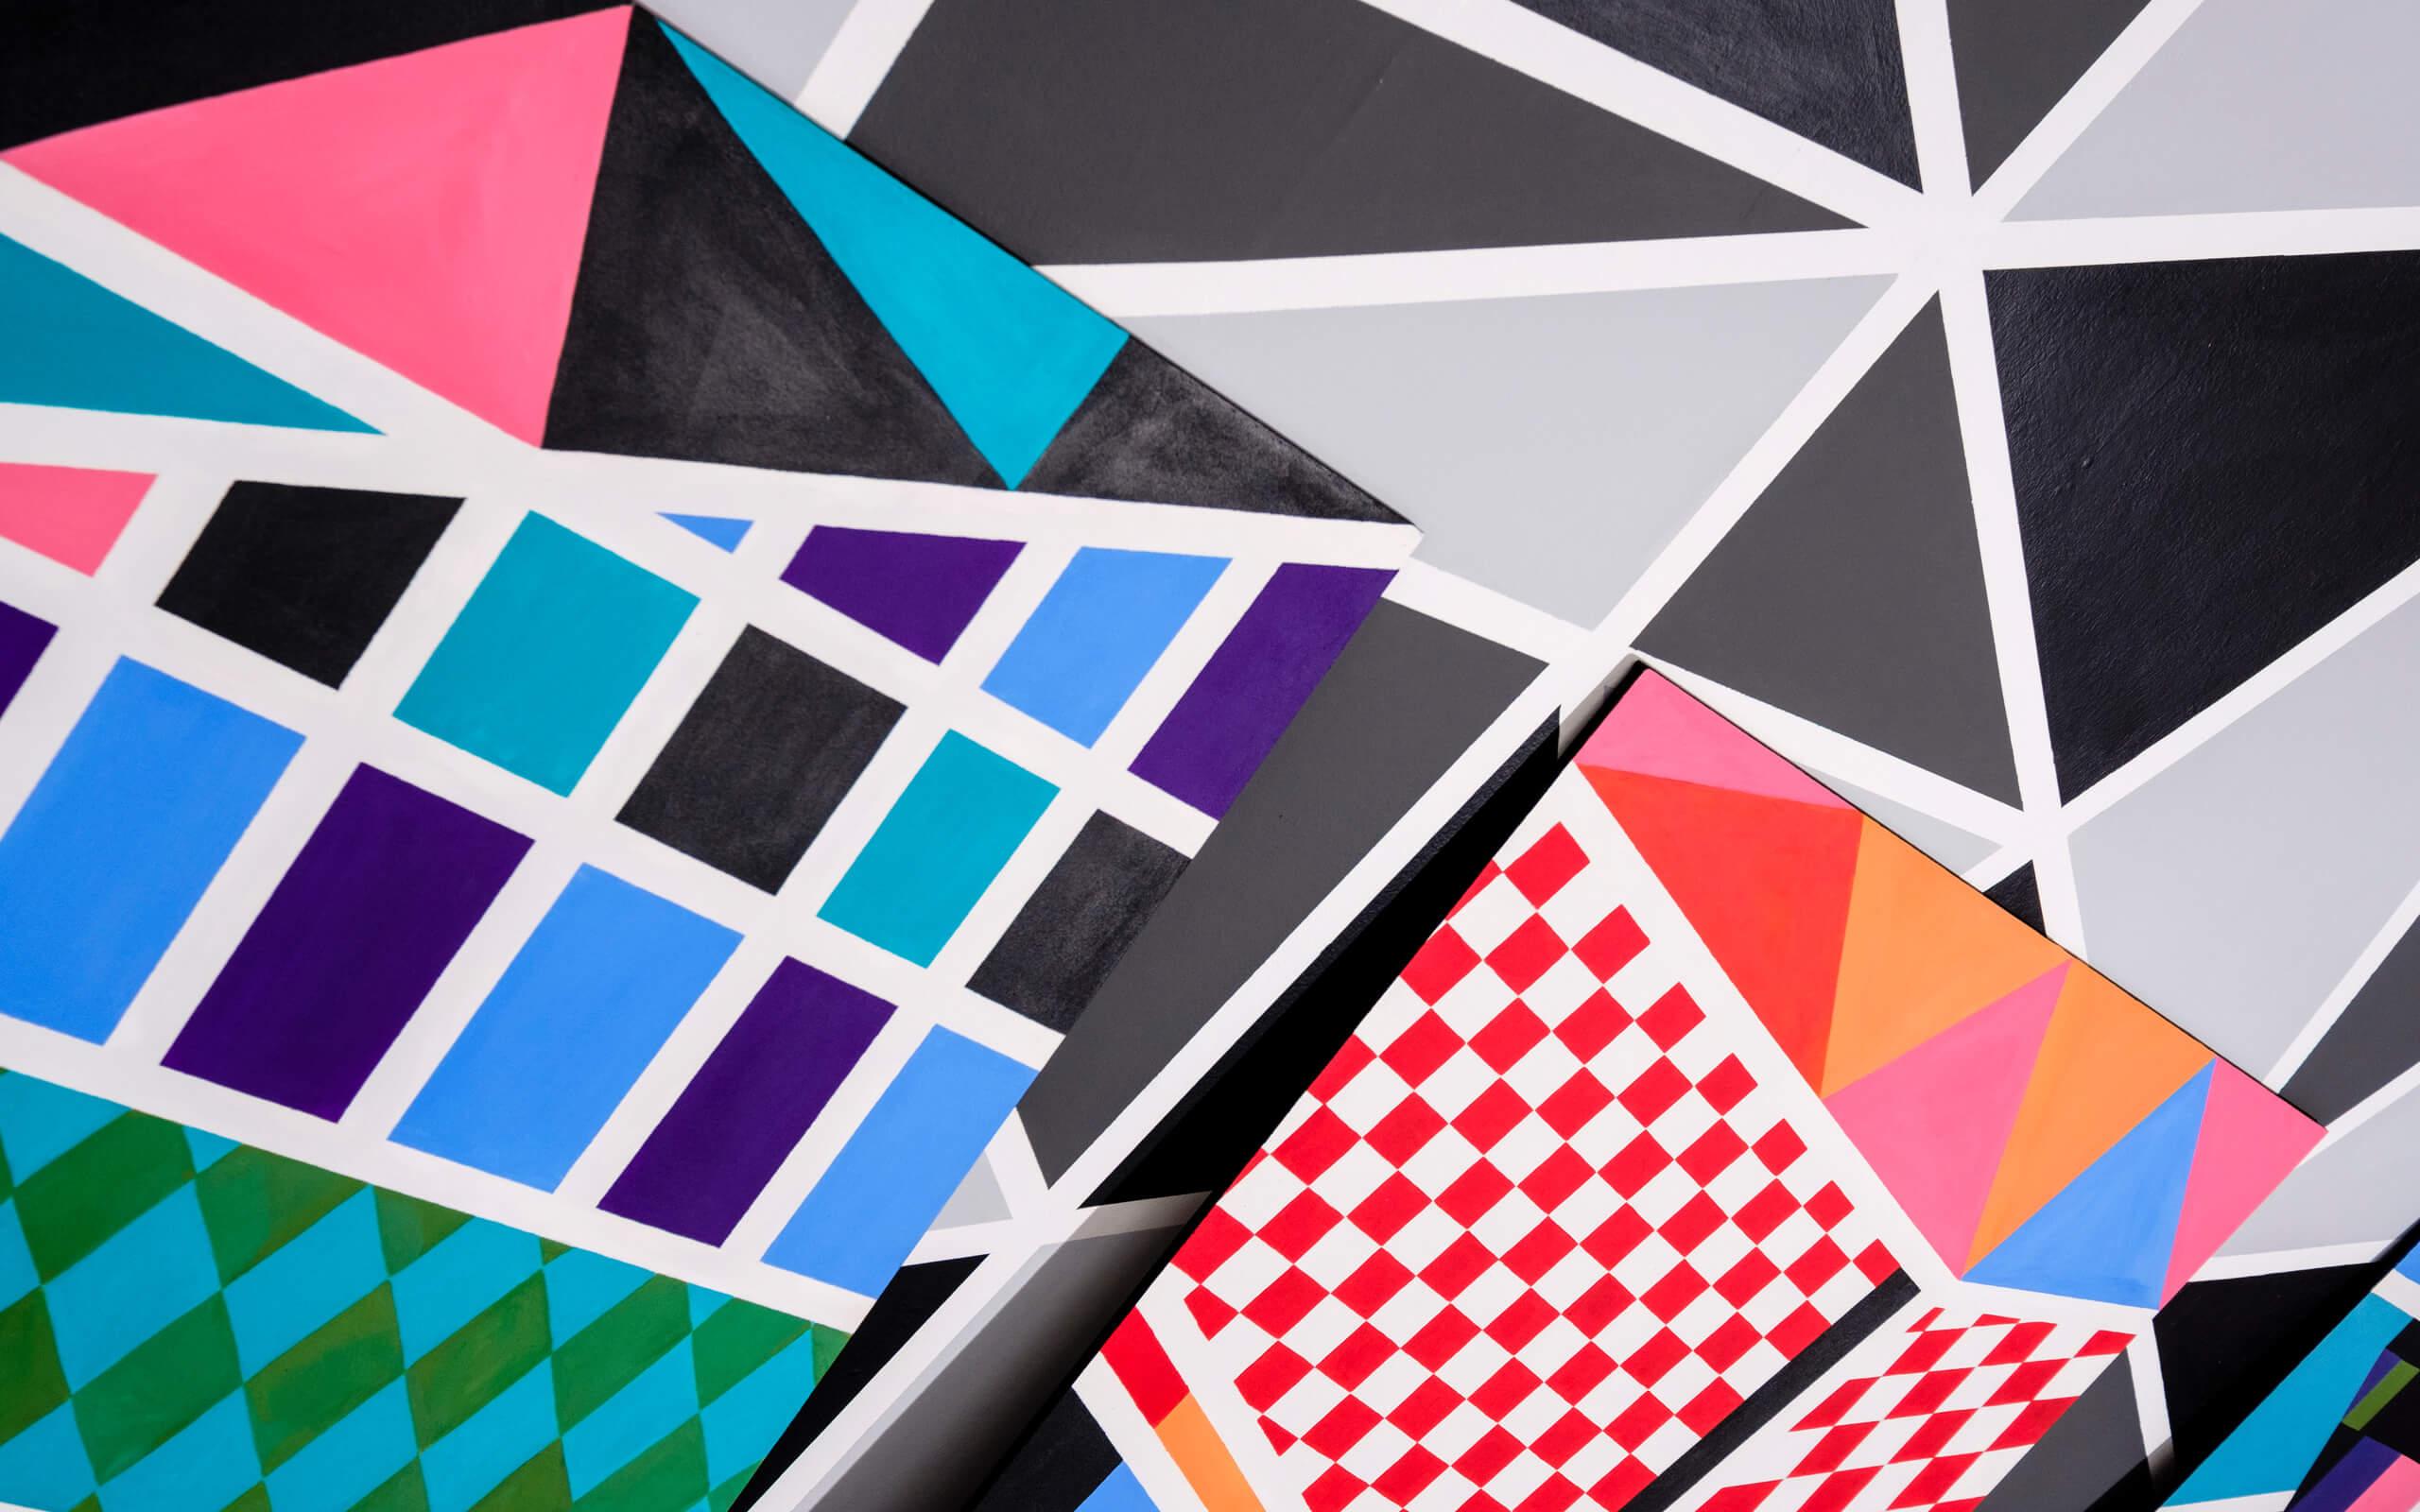 colourful cube artwork